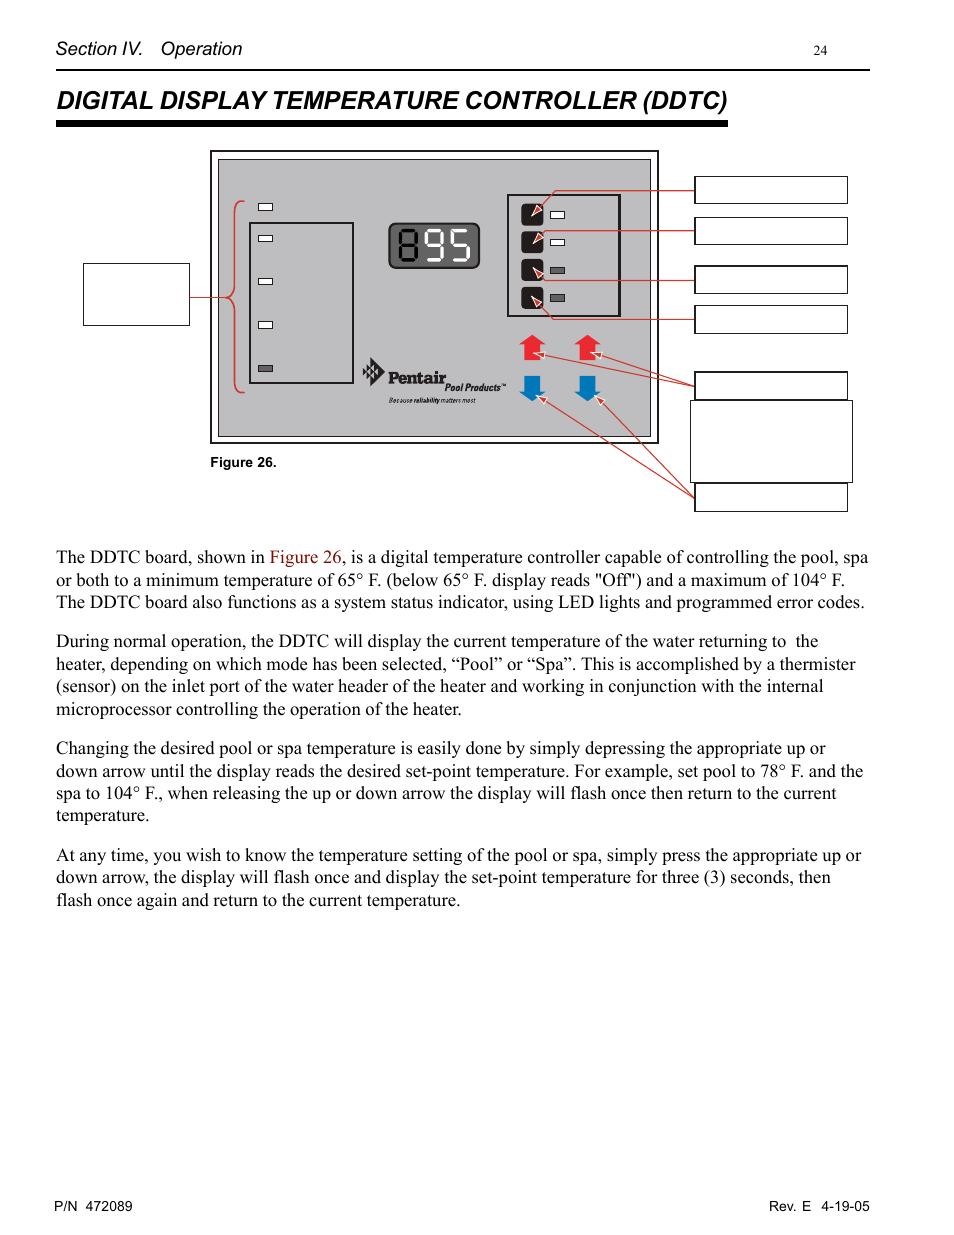 Digital display temperature controller (ddtc) | Pentair